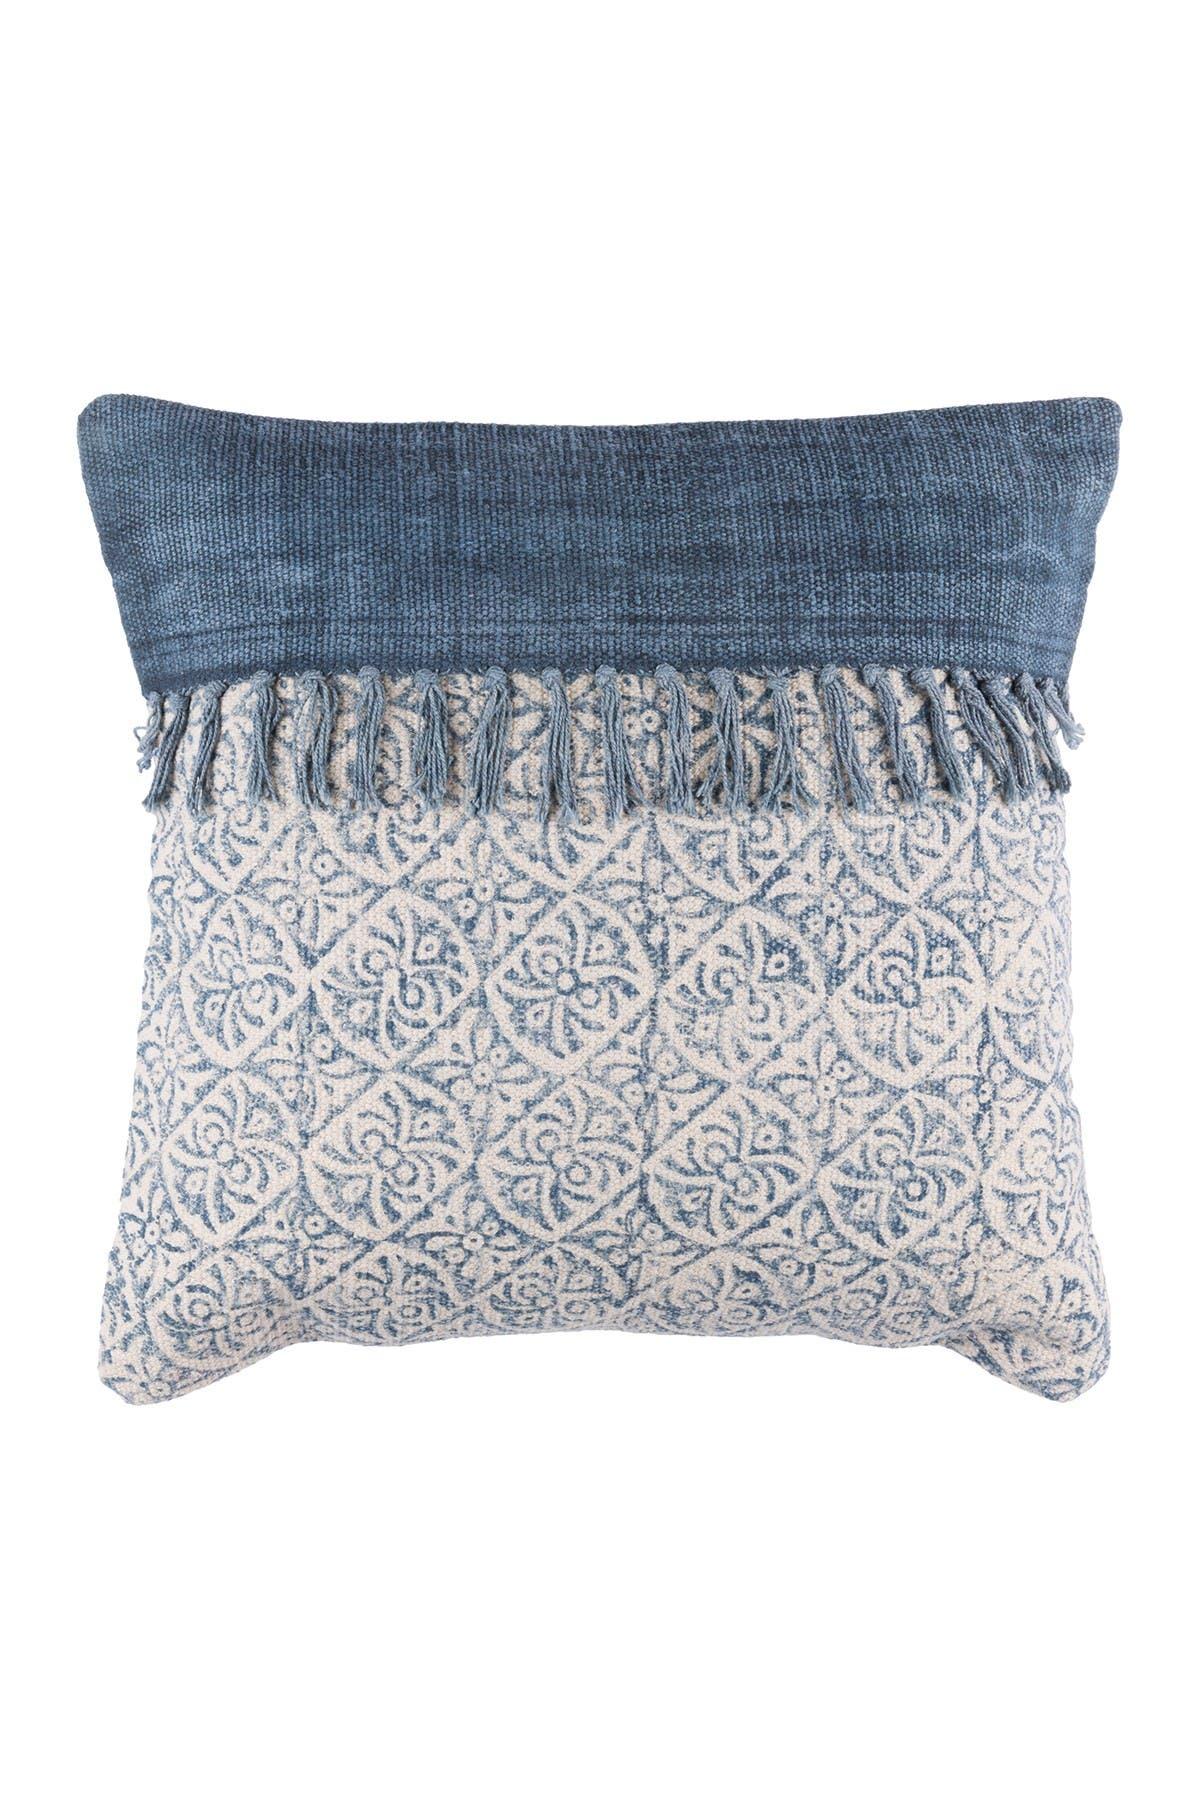 Image of SURYA HOME Cream Lola Bohemian/Global Pillow